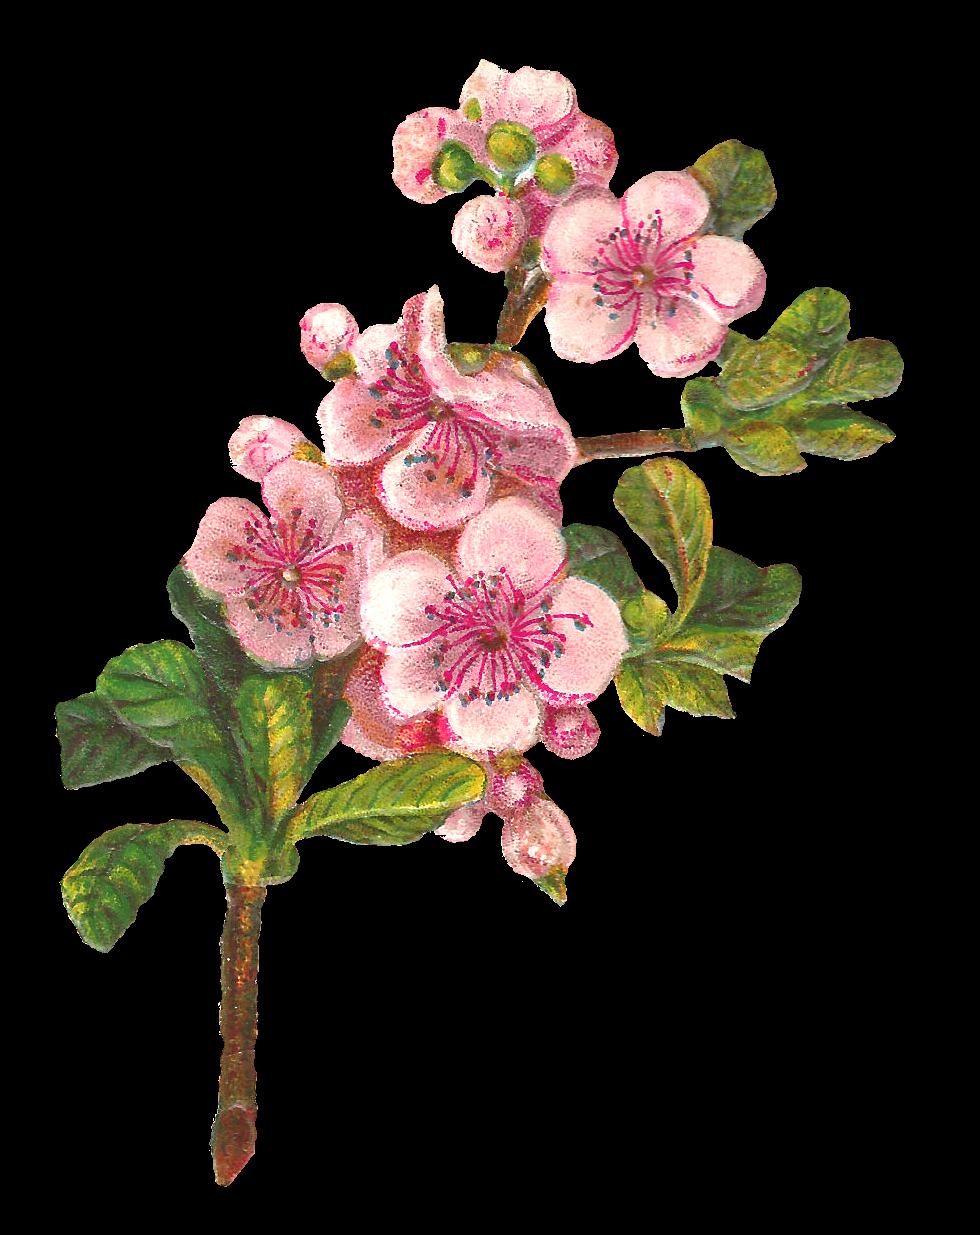 Clipart roses apple tree. Antique images botanical art